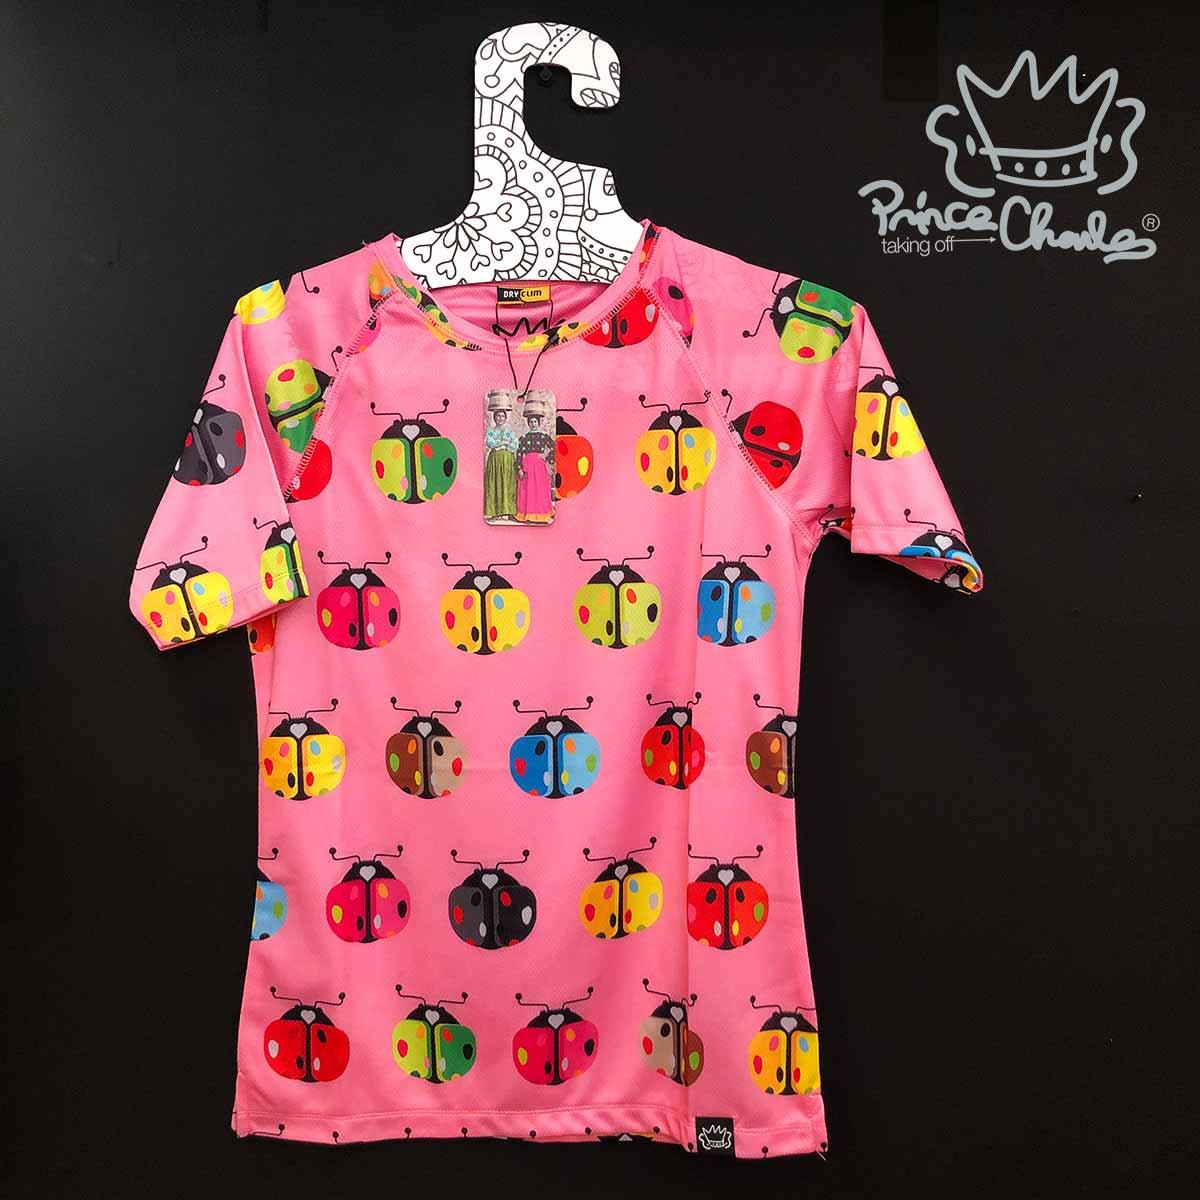 camisetas online prinprince charles camiseta prenda fitness camisetas baiona souvenirs souvenir shop baiona tienda regalos baiona sounirs creativos originales bayprints baionacecharles_seacornios